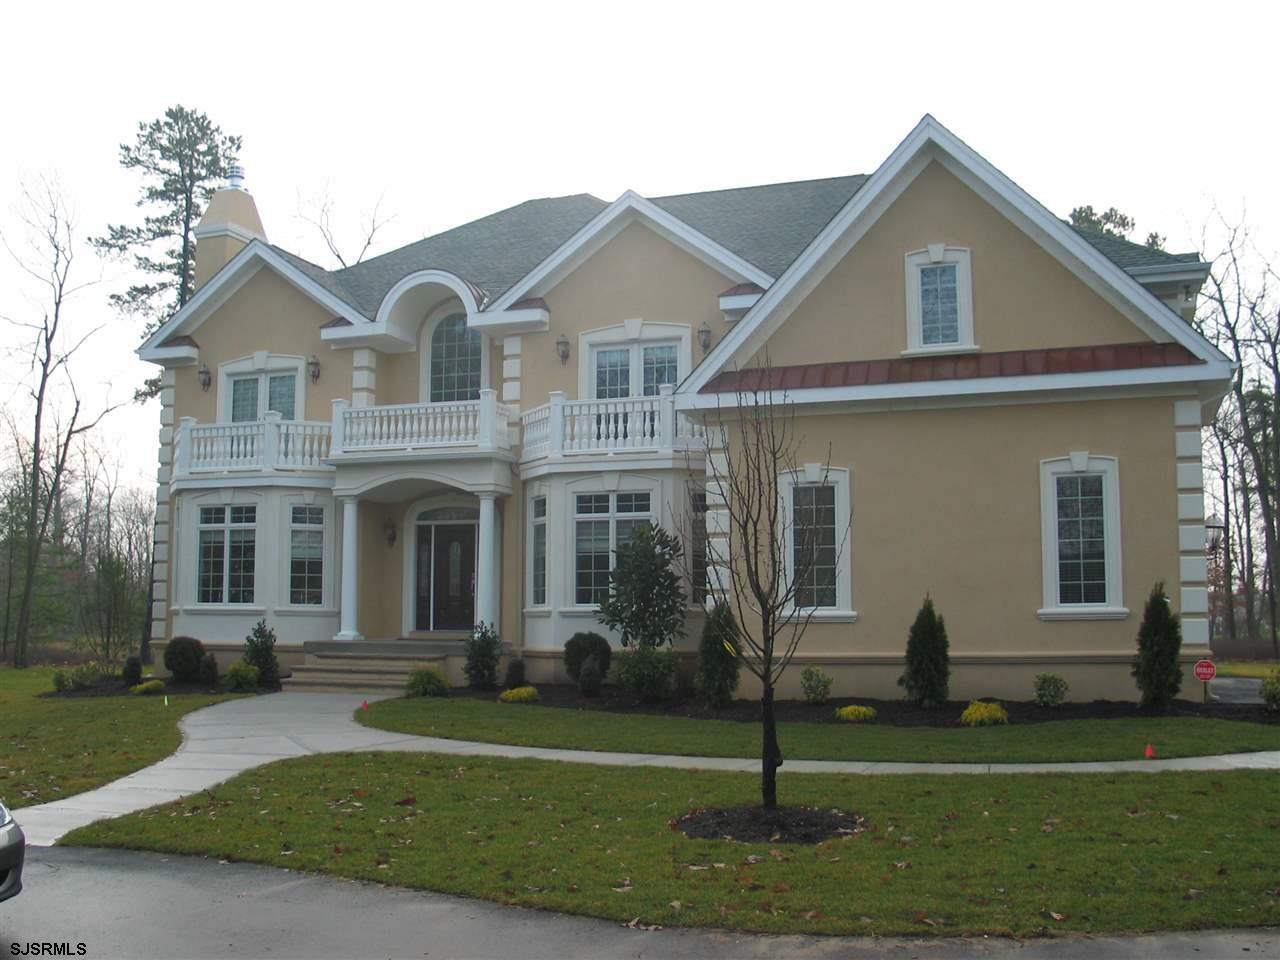 803 Gatehouse Drive Dr, Galloway Township, NJ 08205